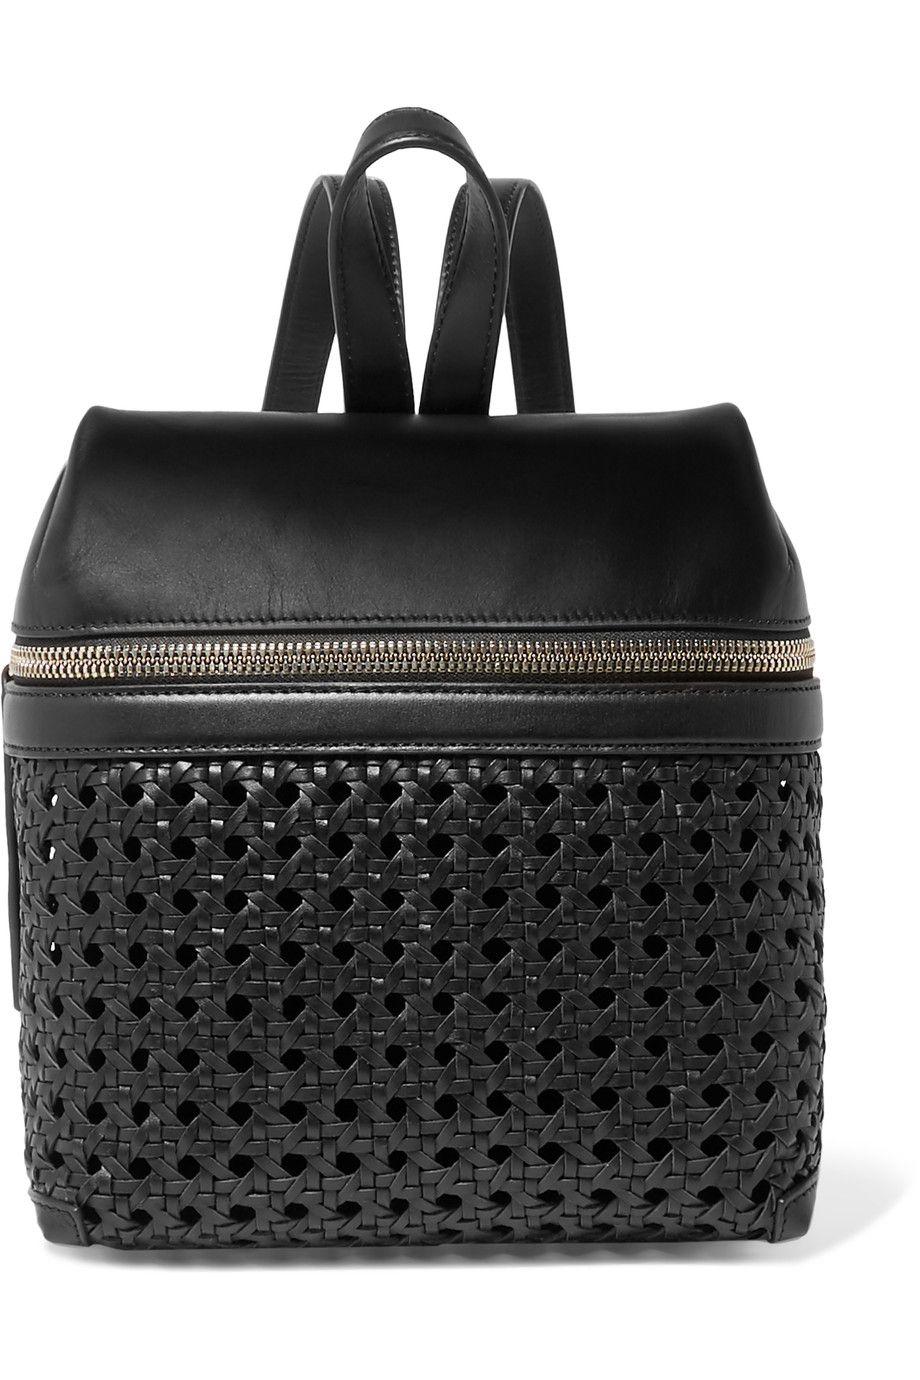 24344472c KARA Small Woven Leather Backpack. #kara #bags #leather #backpacks ...